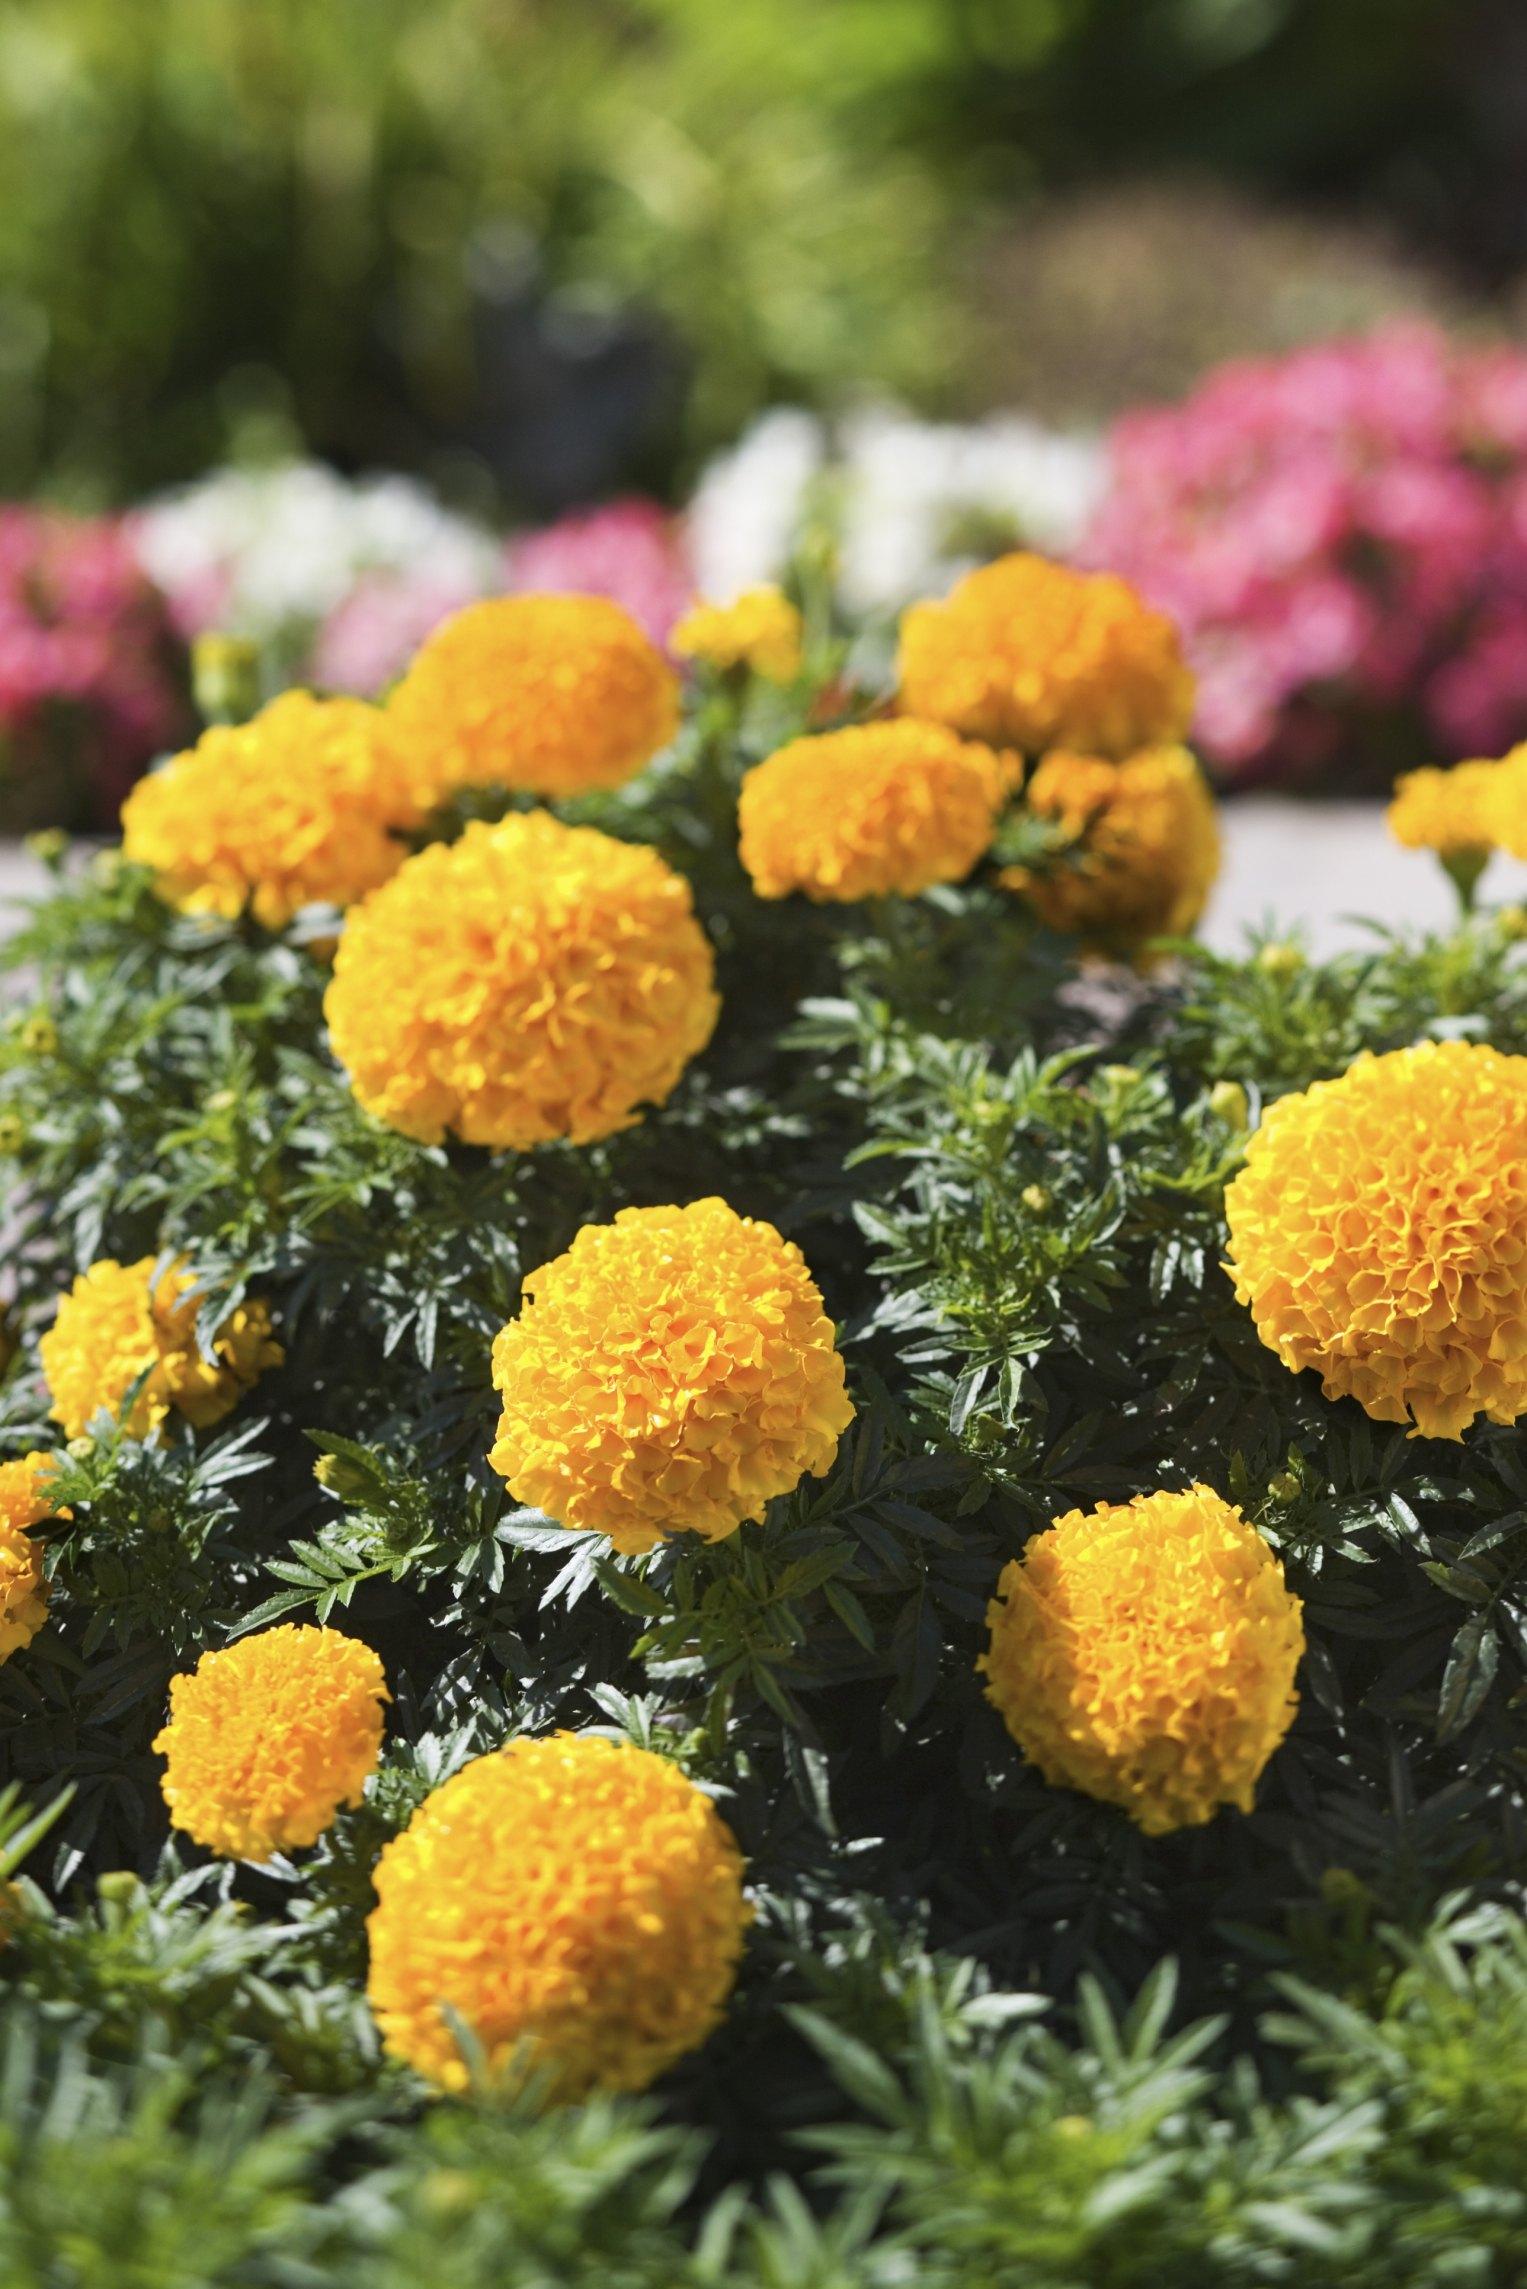 The Marigold Tarot Major Arcana The: How To Preserve Marigold Seeds From Your Garden